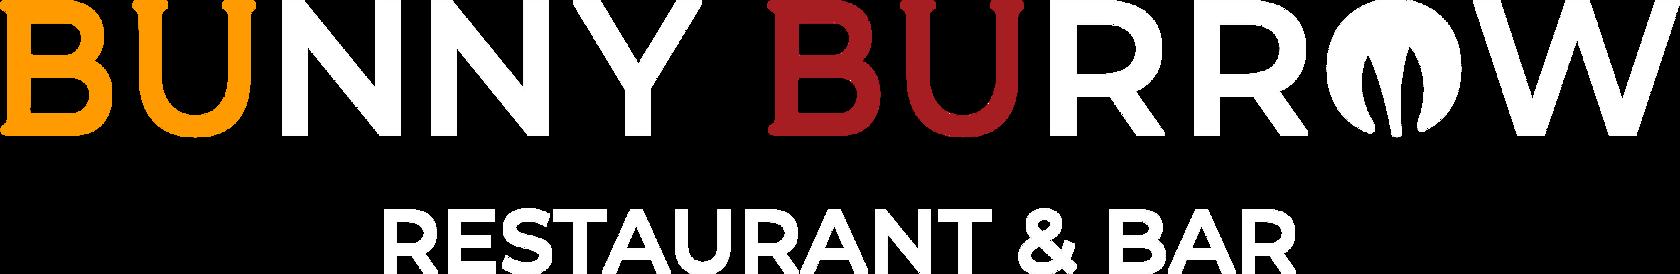 Bunny Burrow